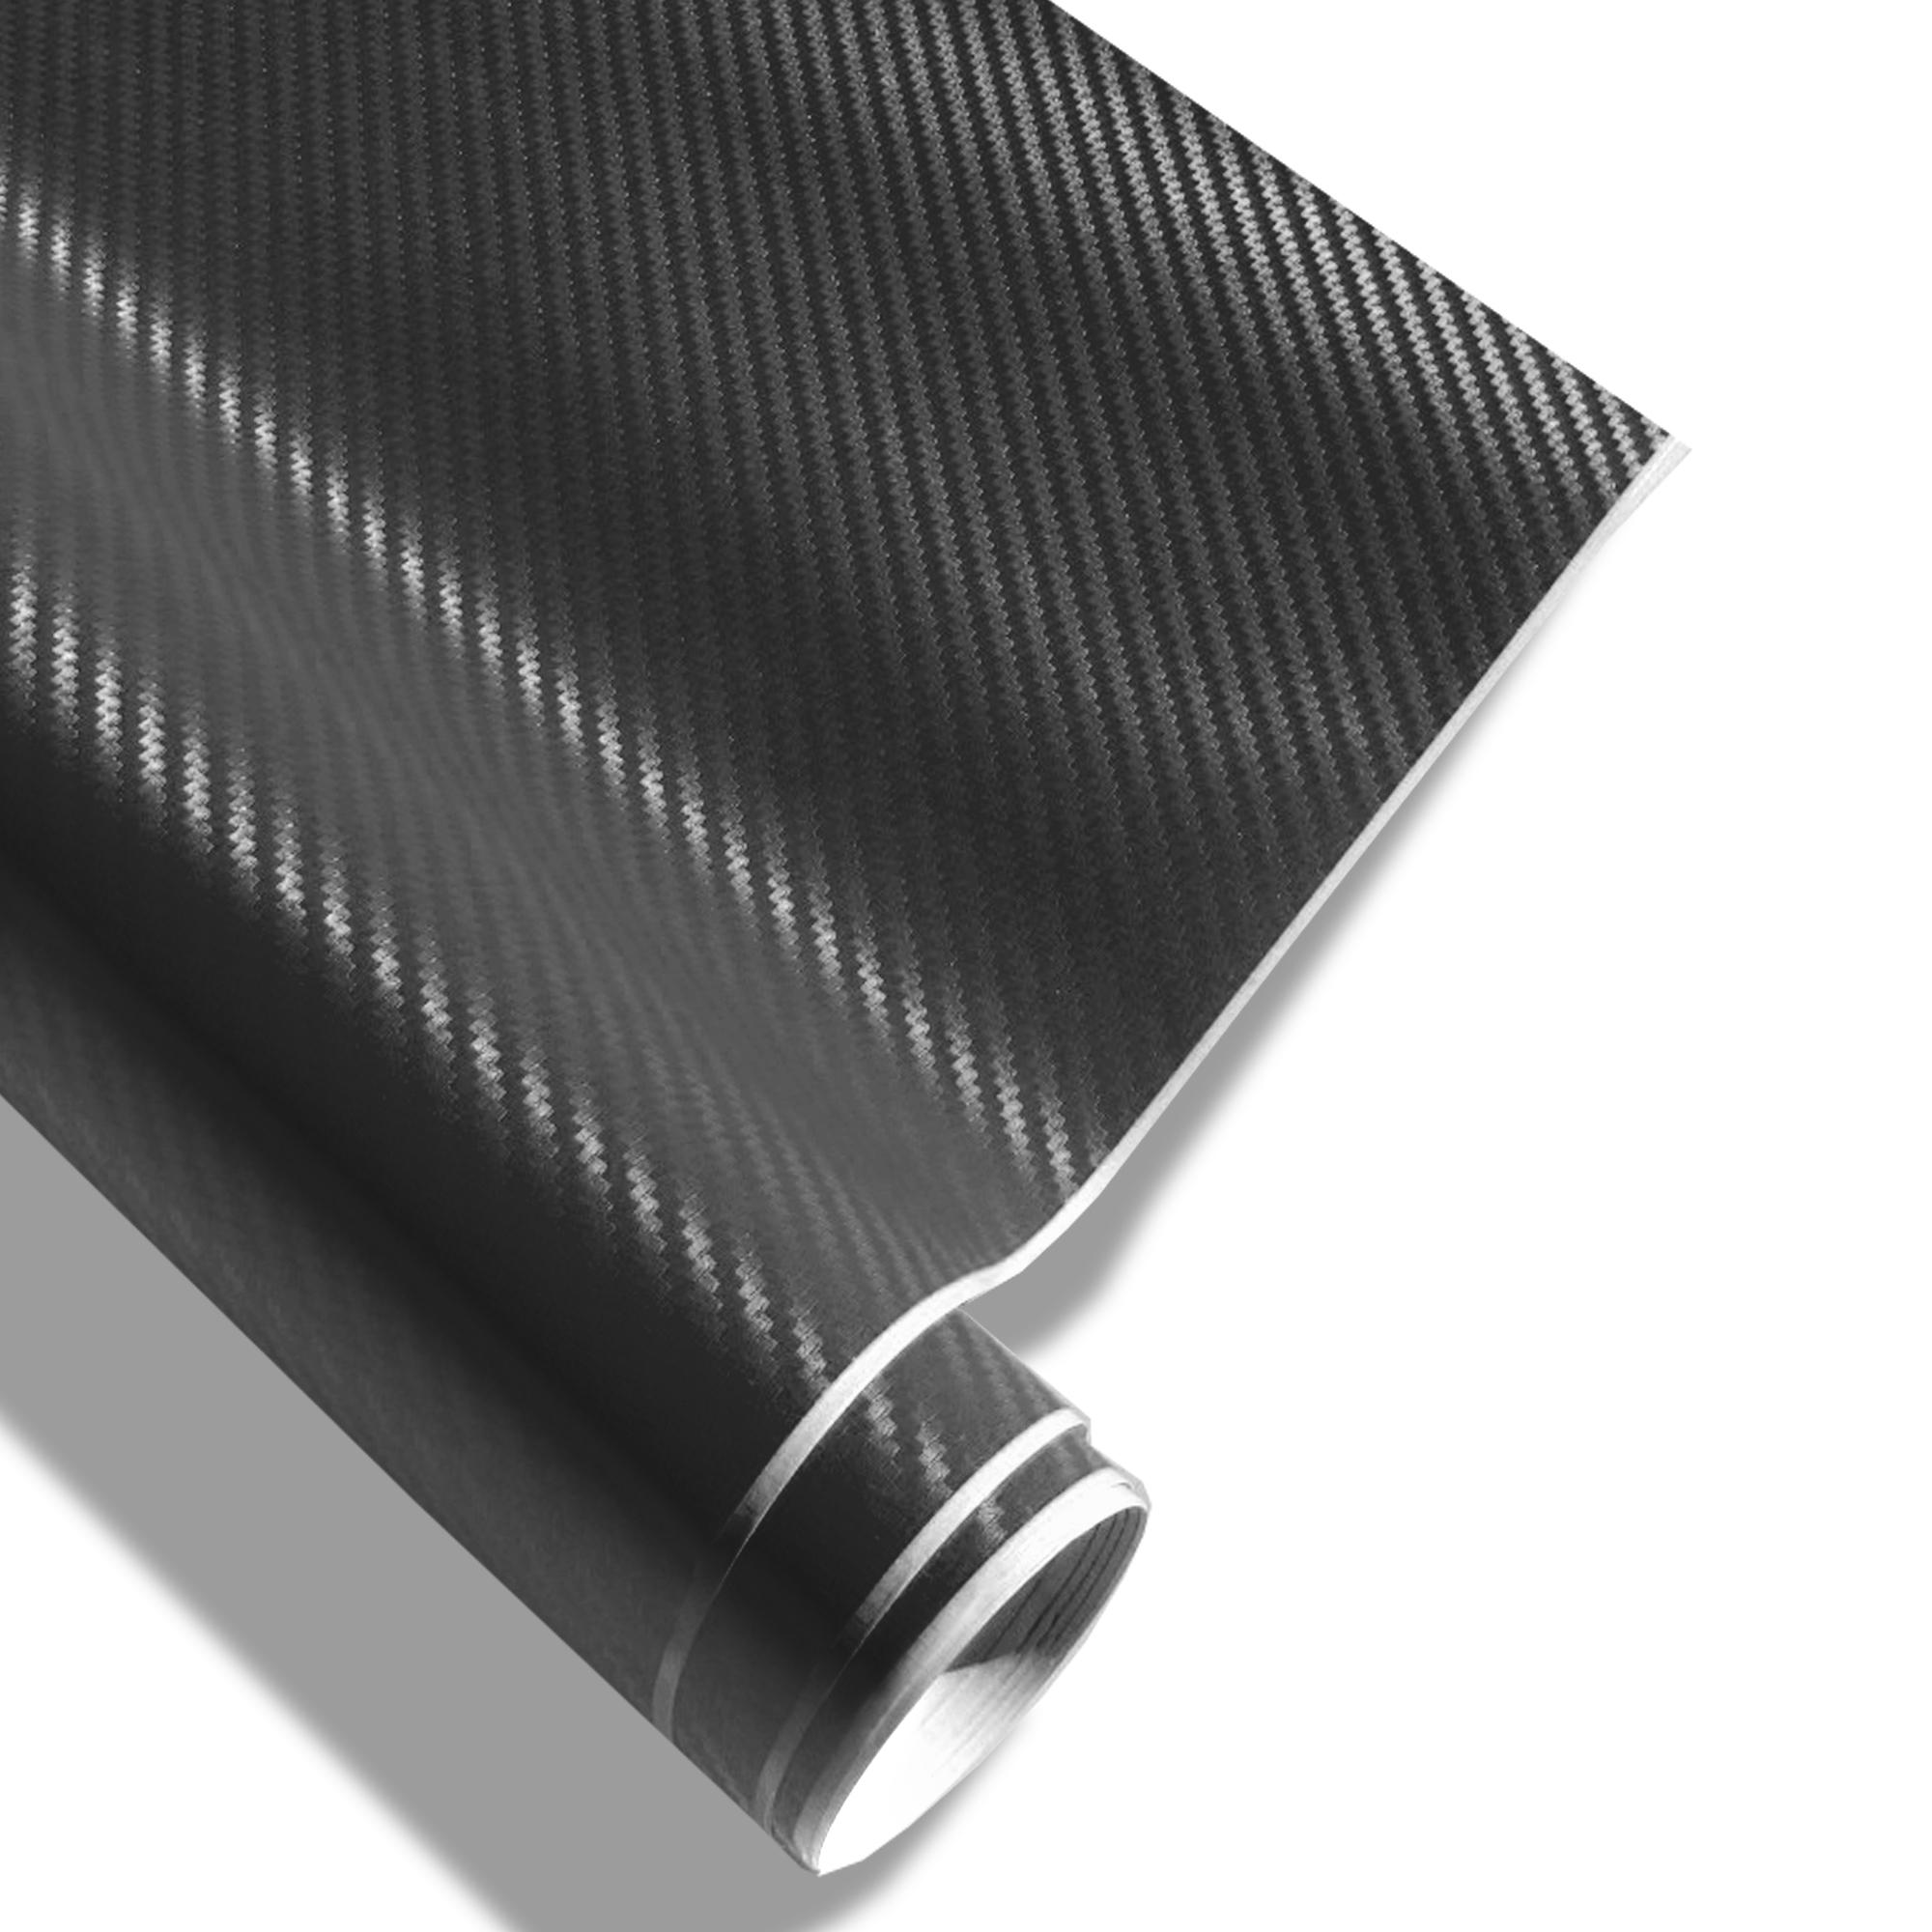 carbonfolie jom schwarz xxl 152 x 200 cm 3d struktur geeignet f r innen u au en. Black Bedroom Furniture Sets. Home Design Ideas